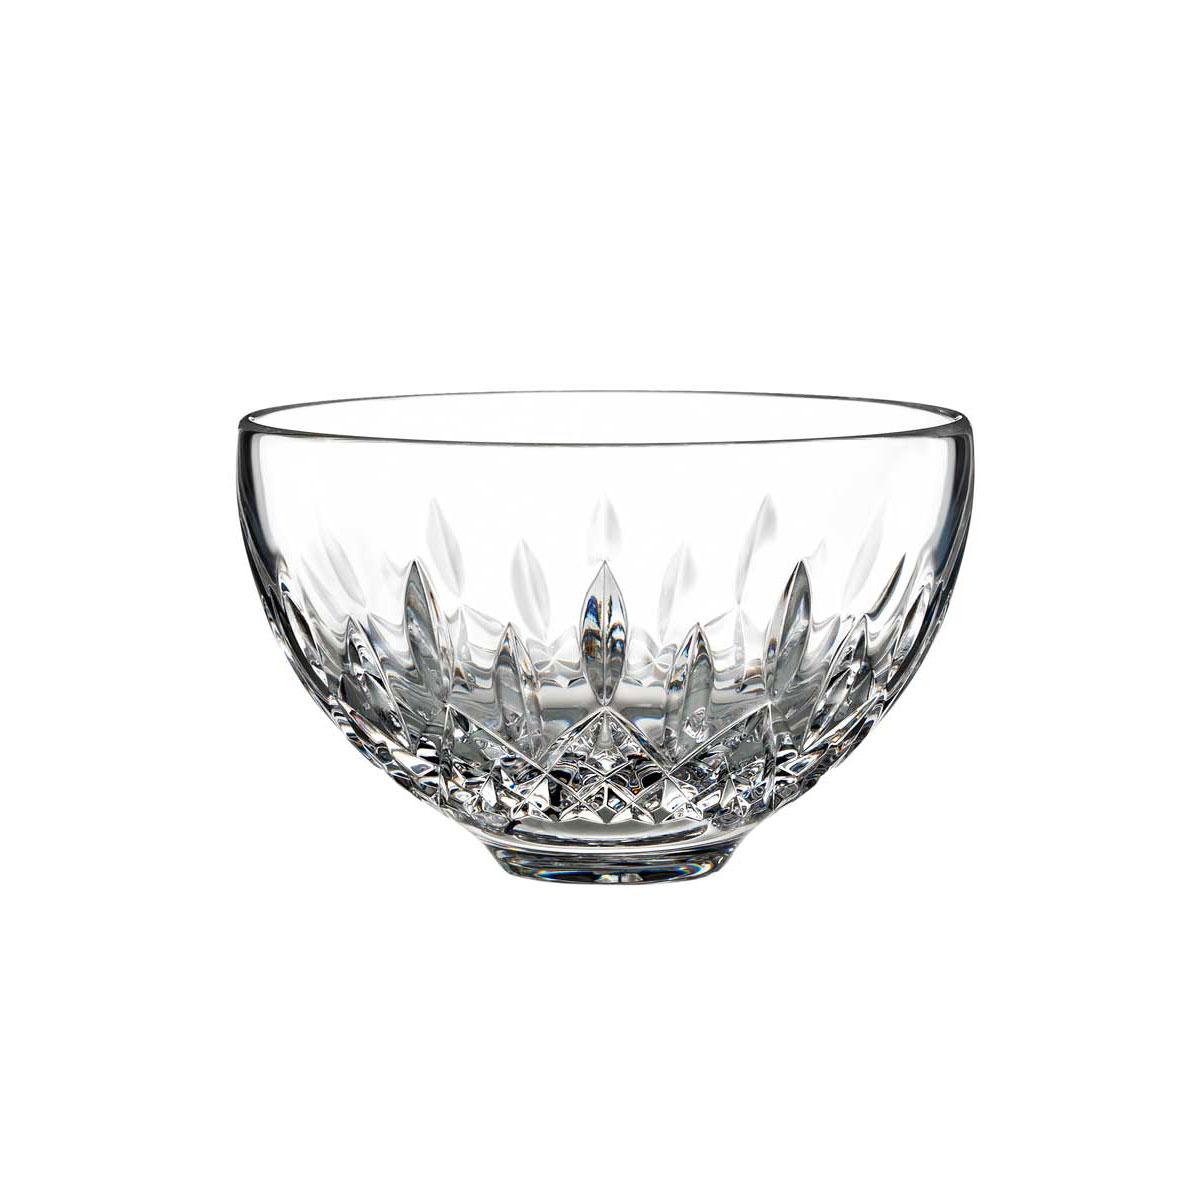 "Waterford Crystal, Giftology Lismore 5"" Honey Crystal Bowl"